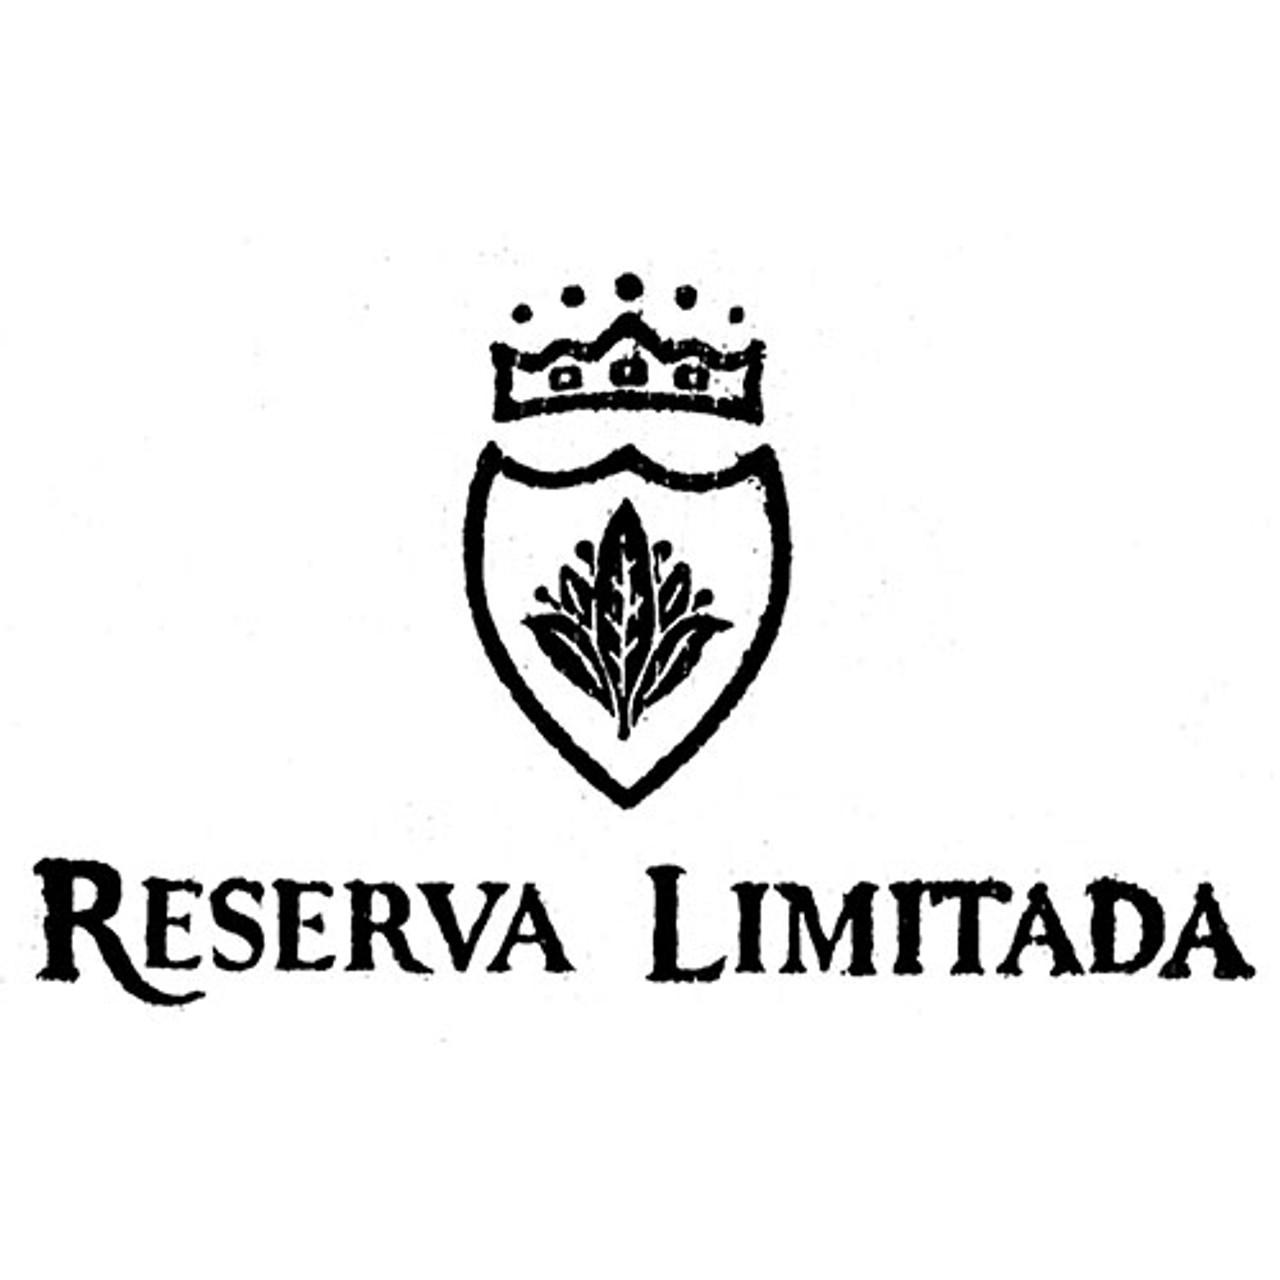 Curivari Reserva Limitada Cafe Café 52 Cigars - 5 x 52 (Box of 10)